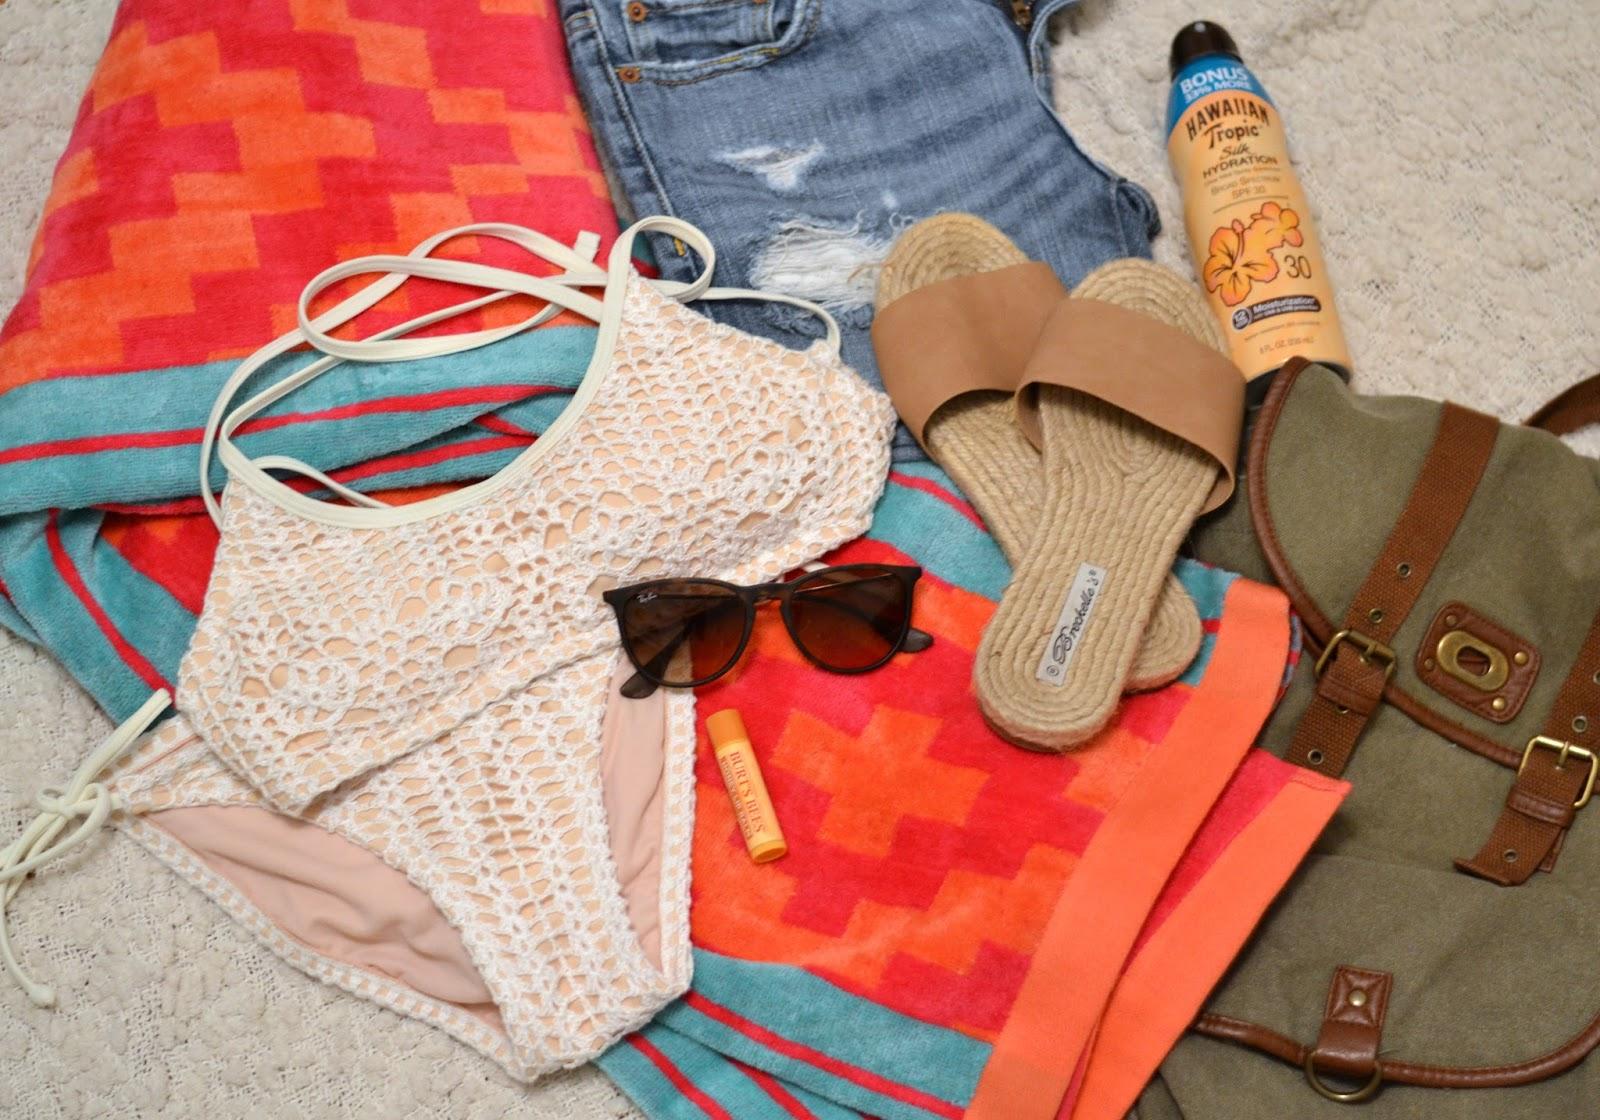 Lake and beach summer essentials